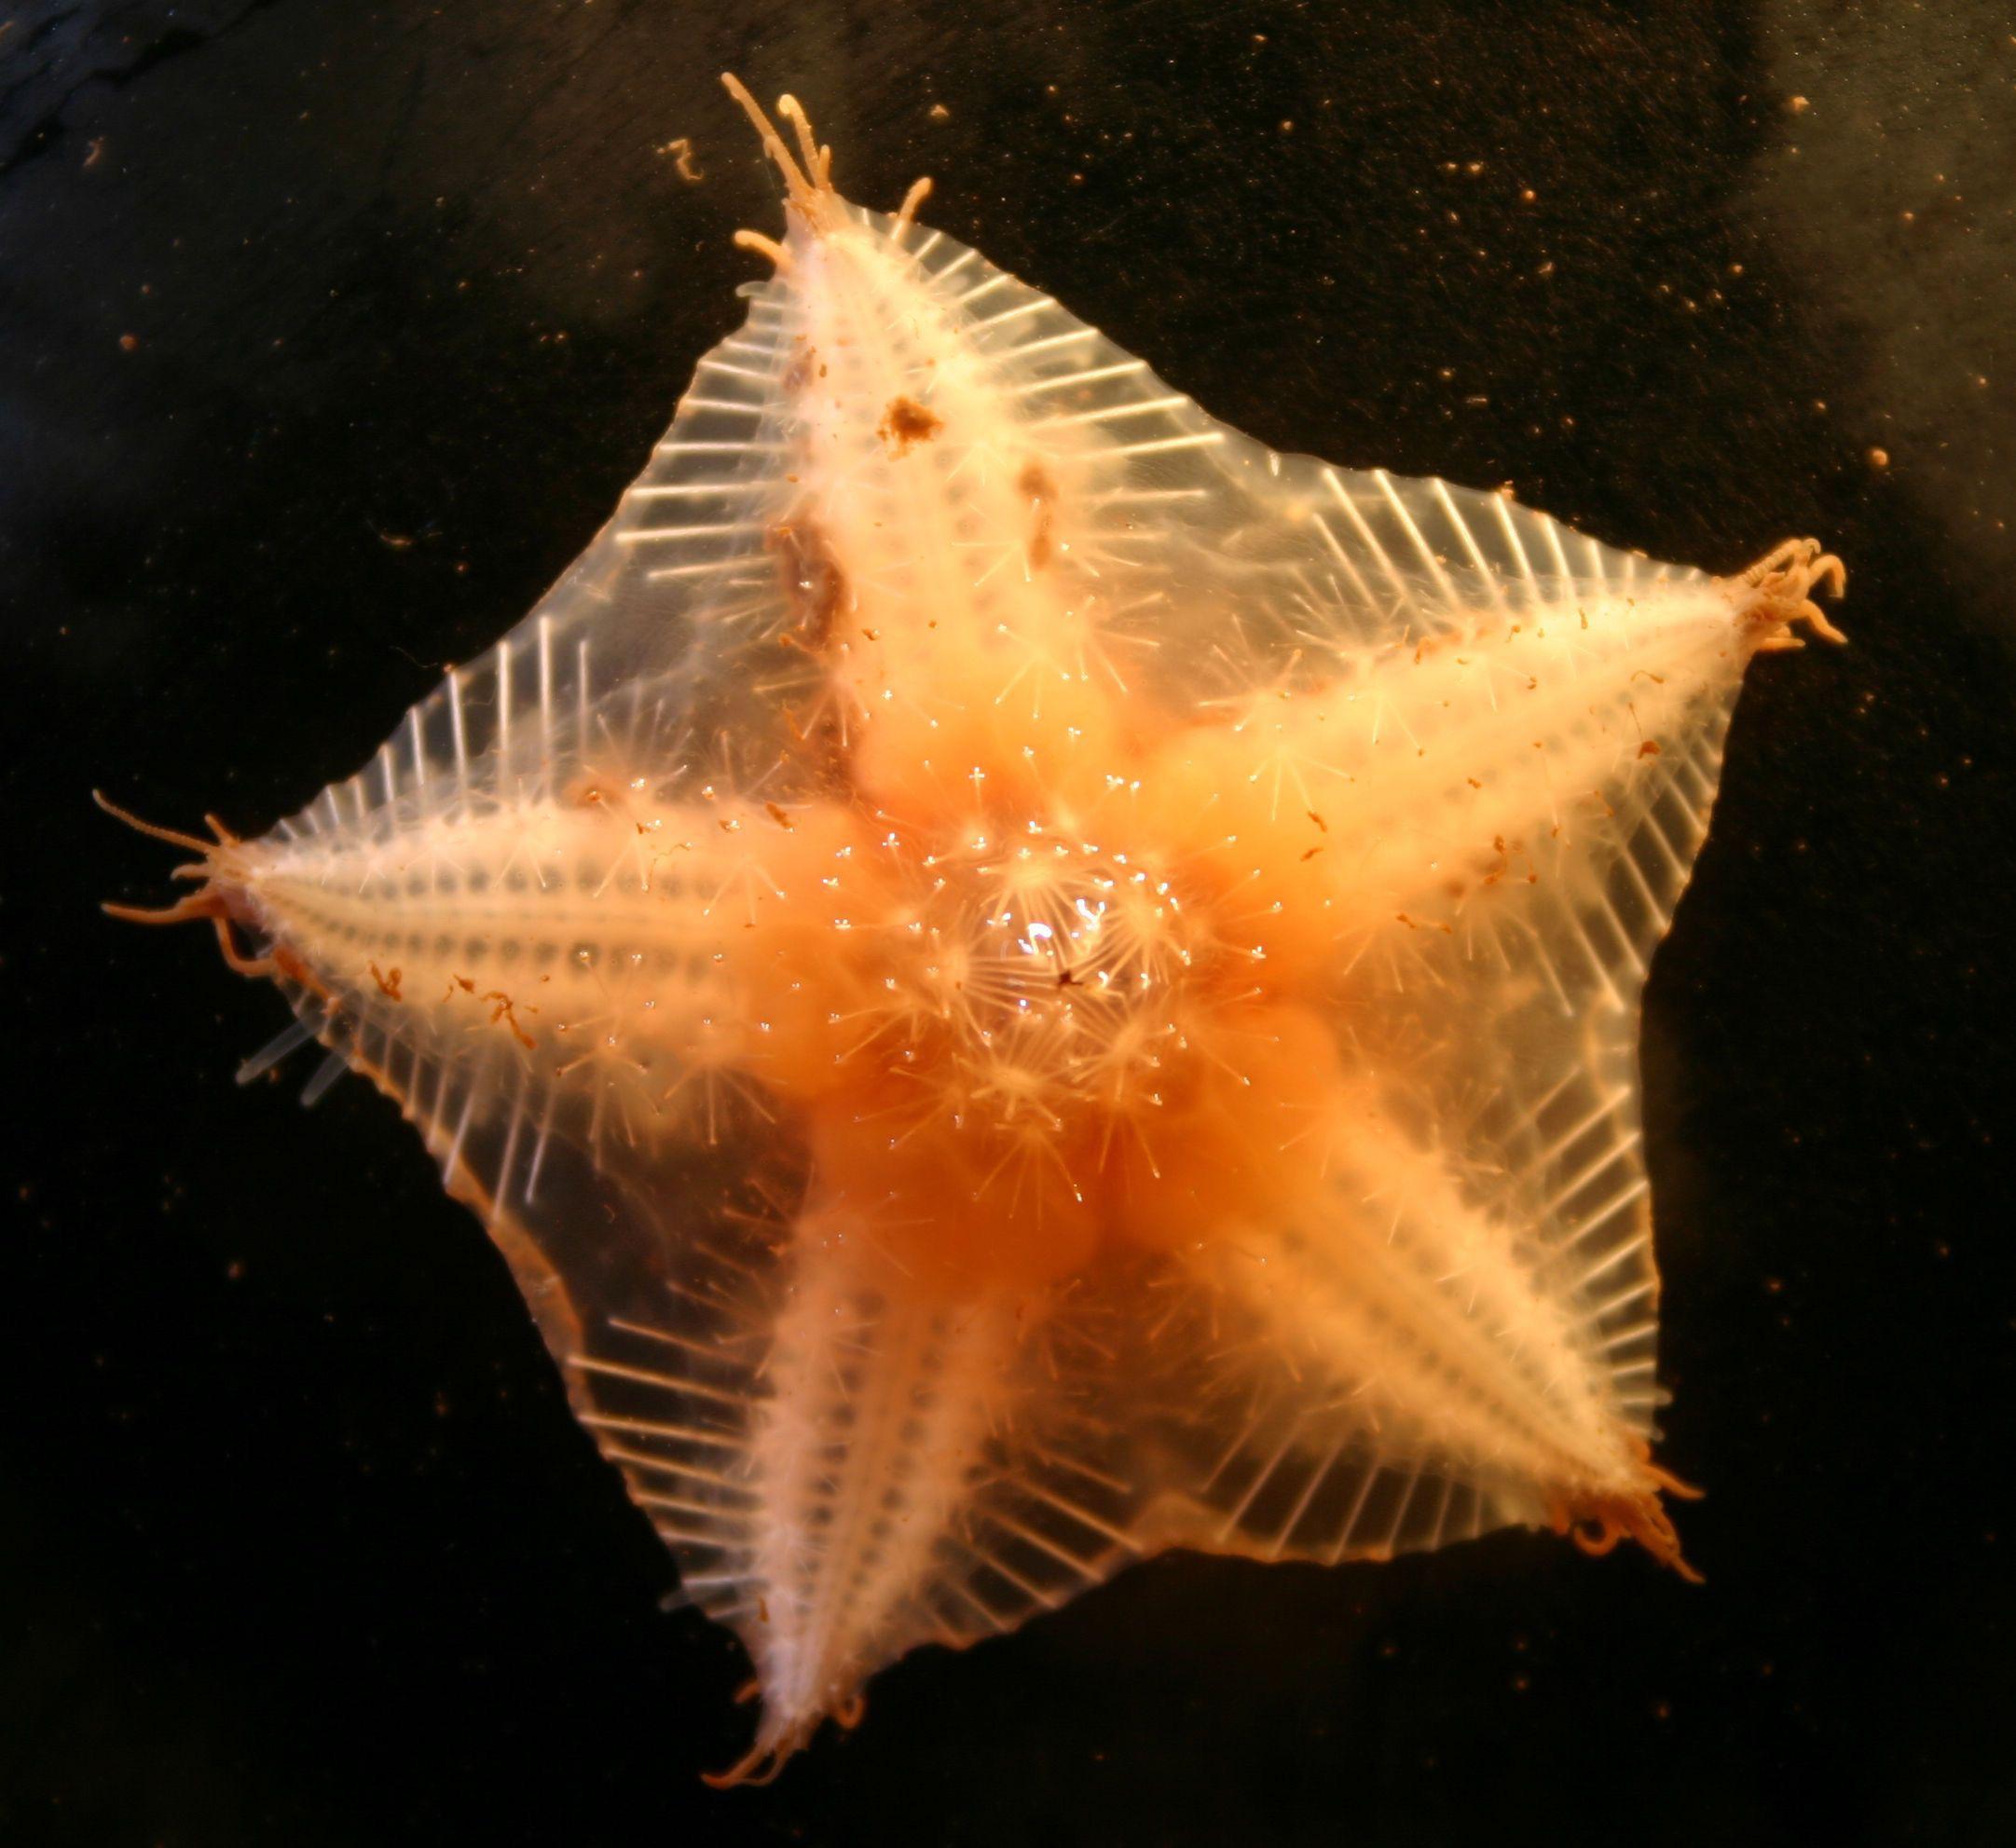 A sea star that's more like a sea pentagon